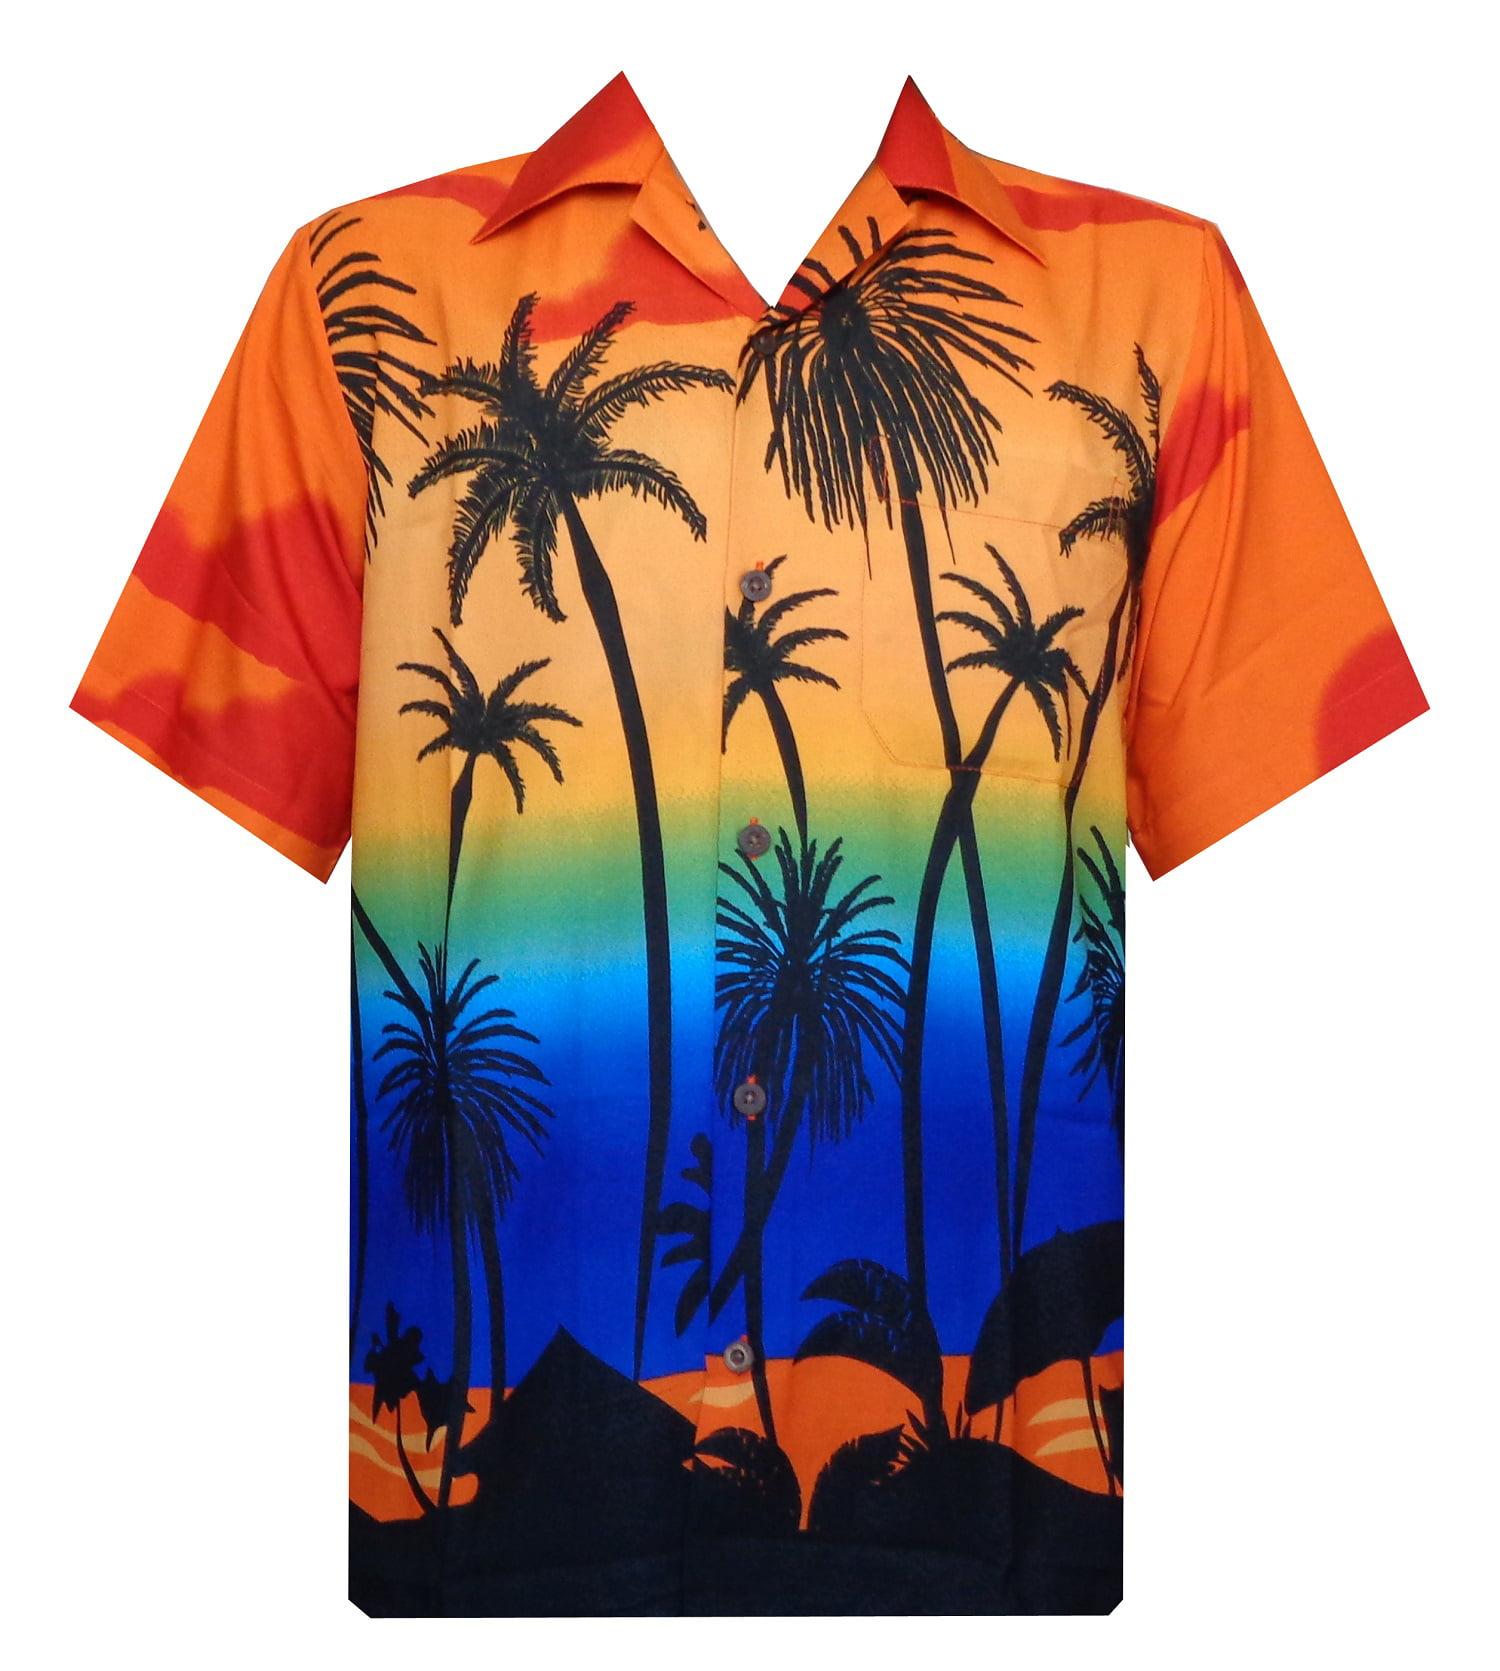 Ewindy Mens Hawaiian Shirt Beautiful Sunset Coconut Hawaiian Shirts Aloha Casual Button Down Short Sleeve Shirt